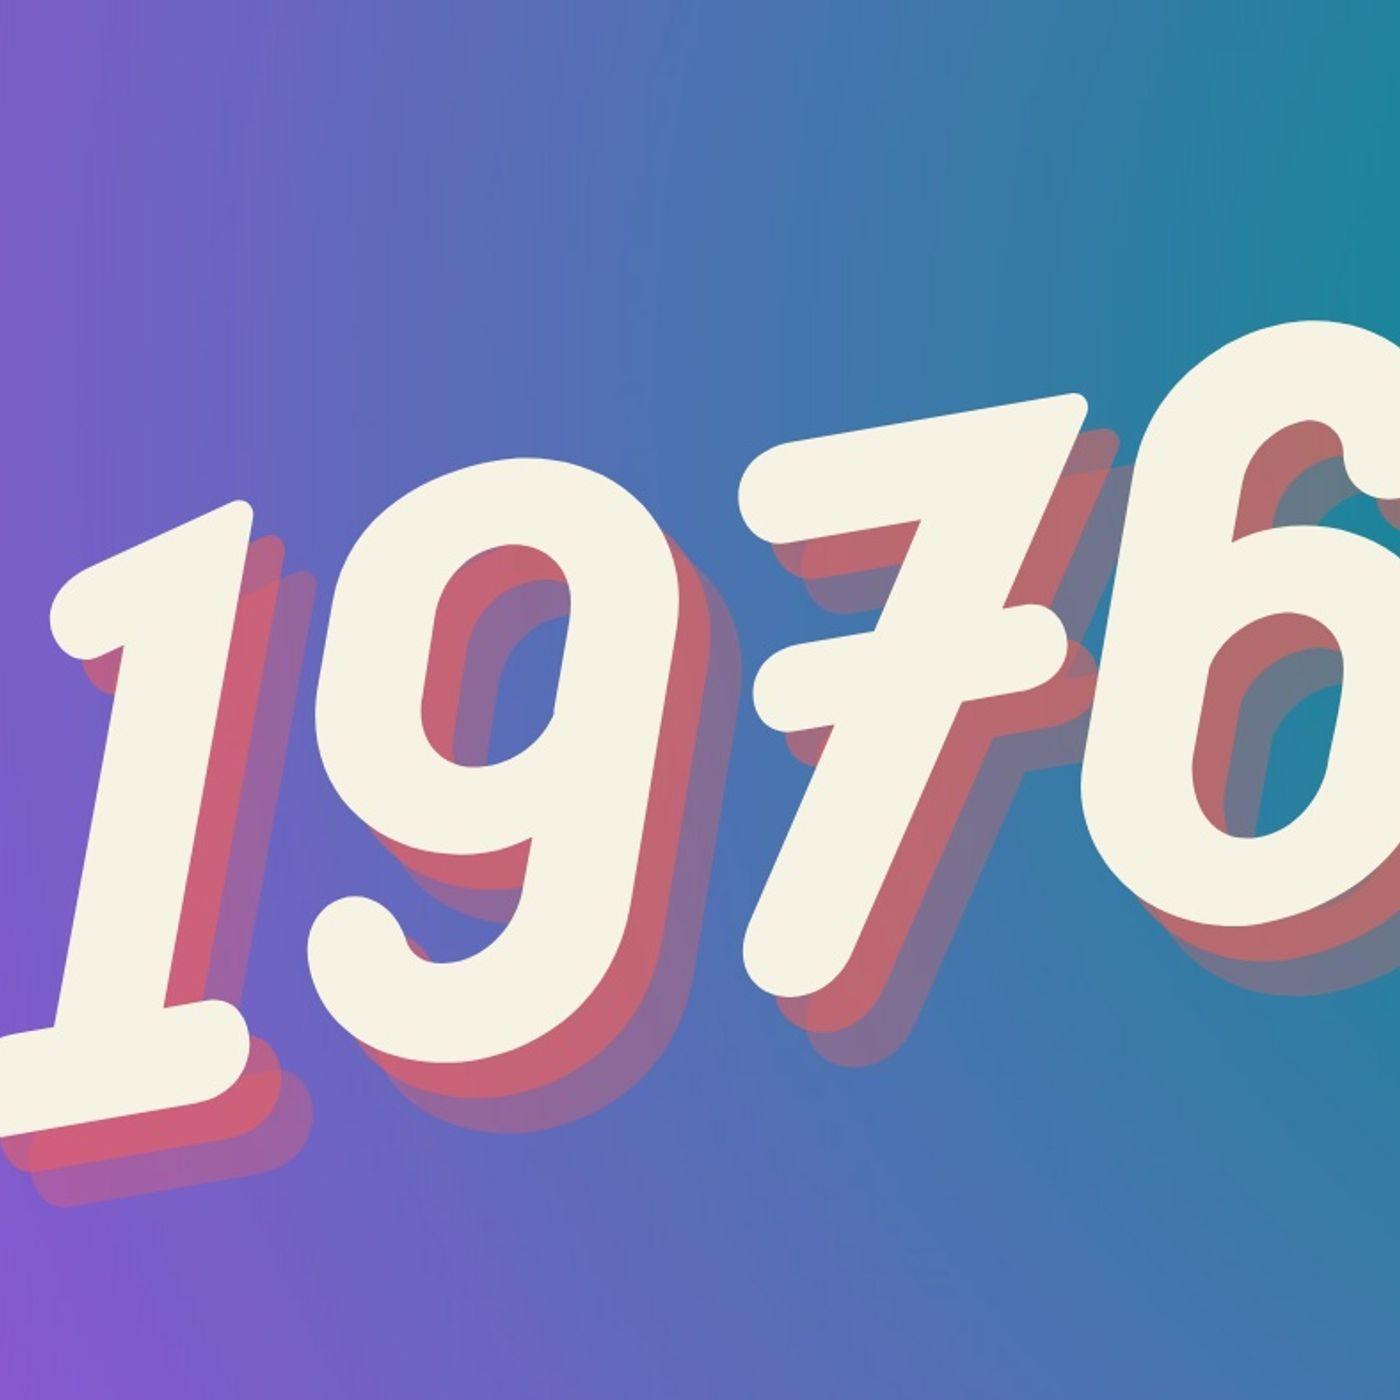 Reelin' Aug 25th, 1976